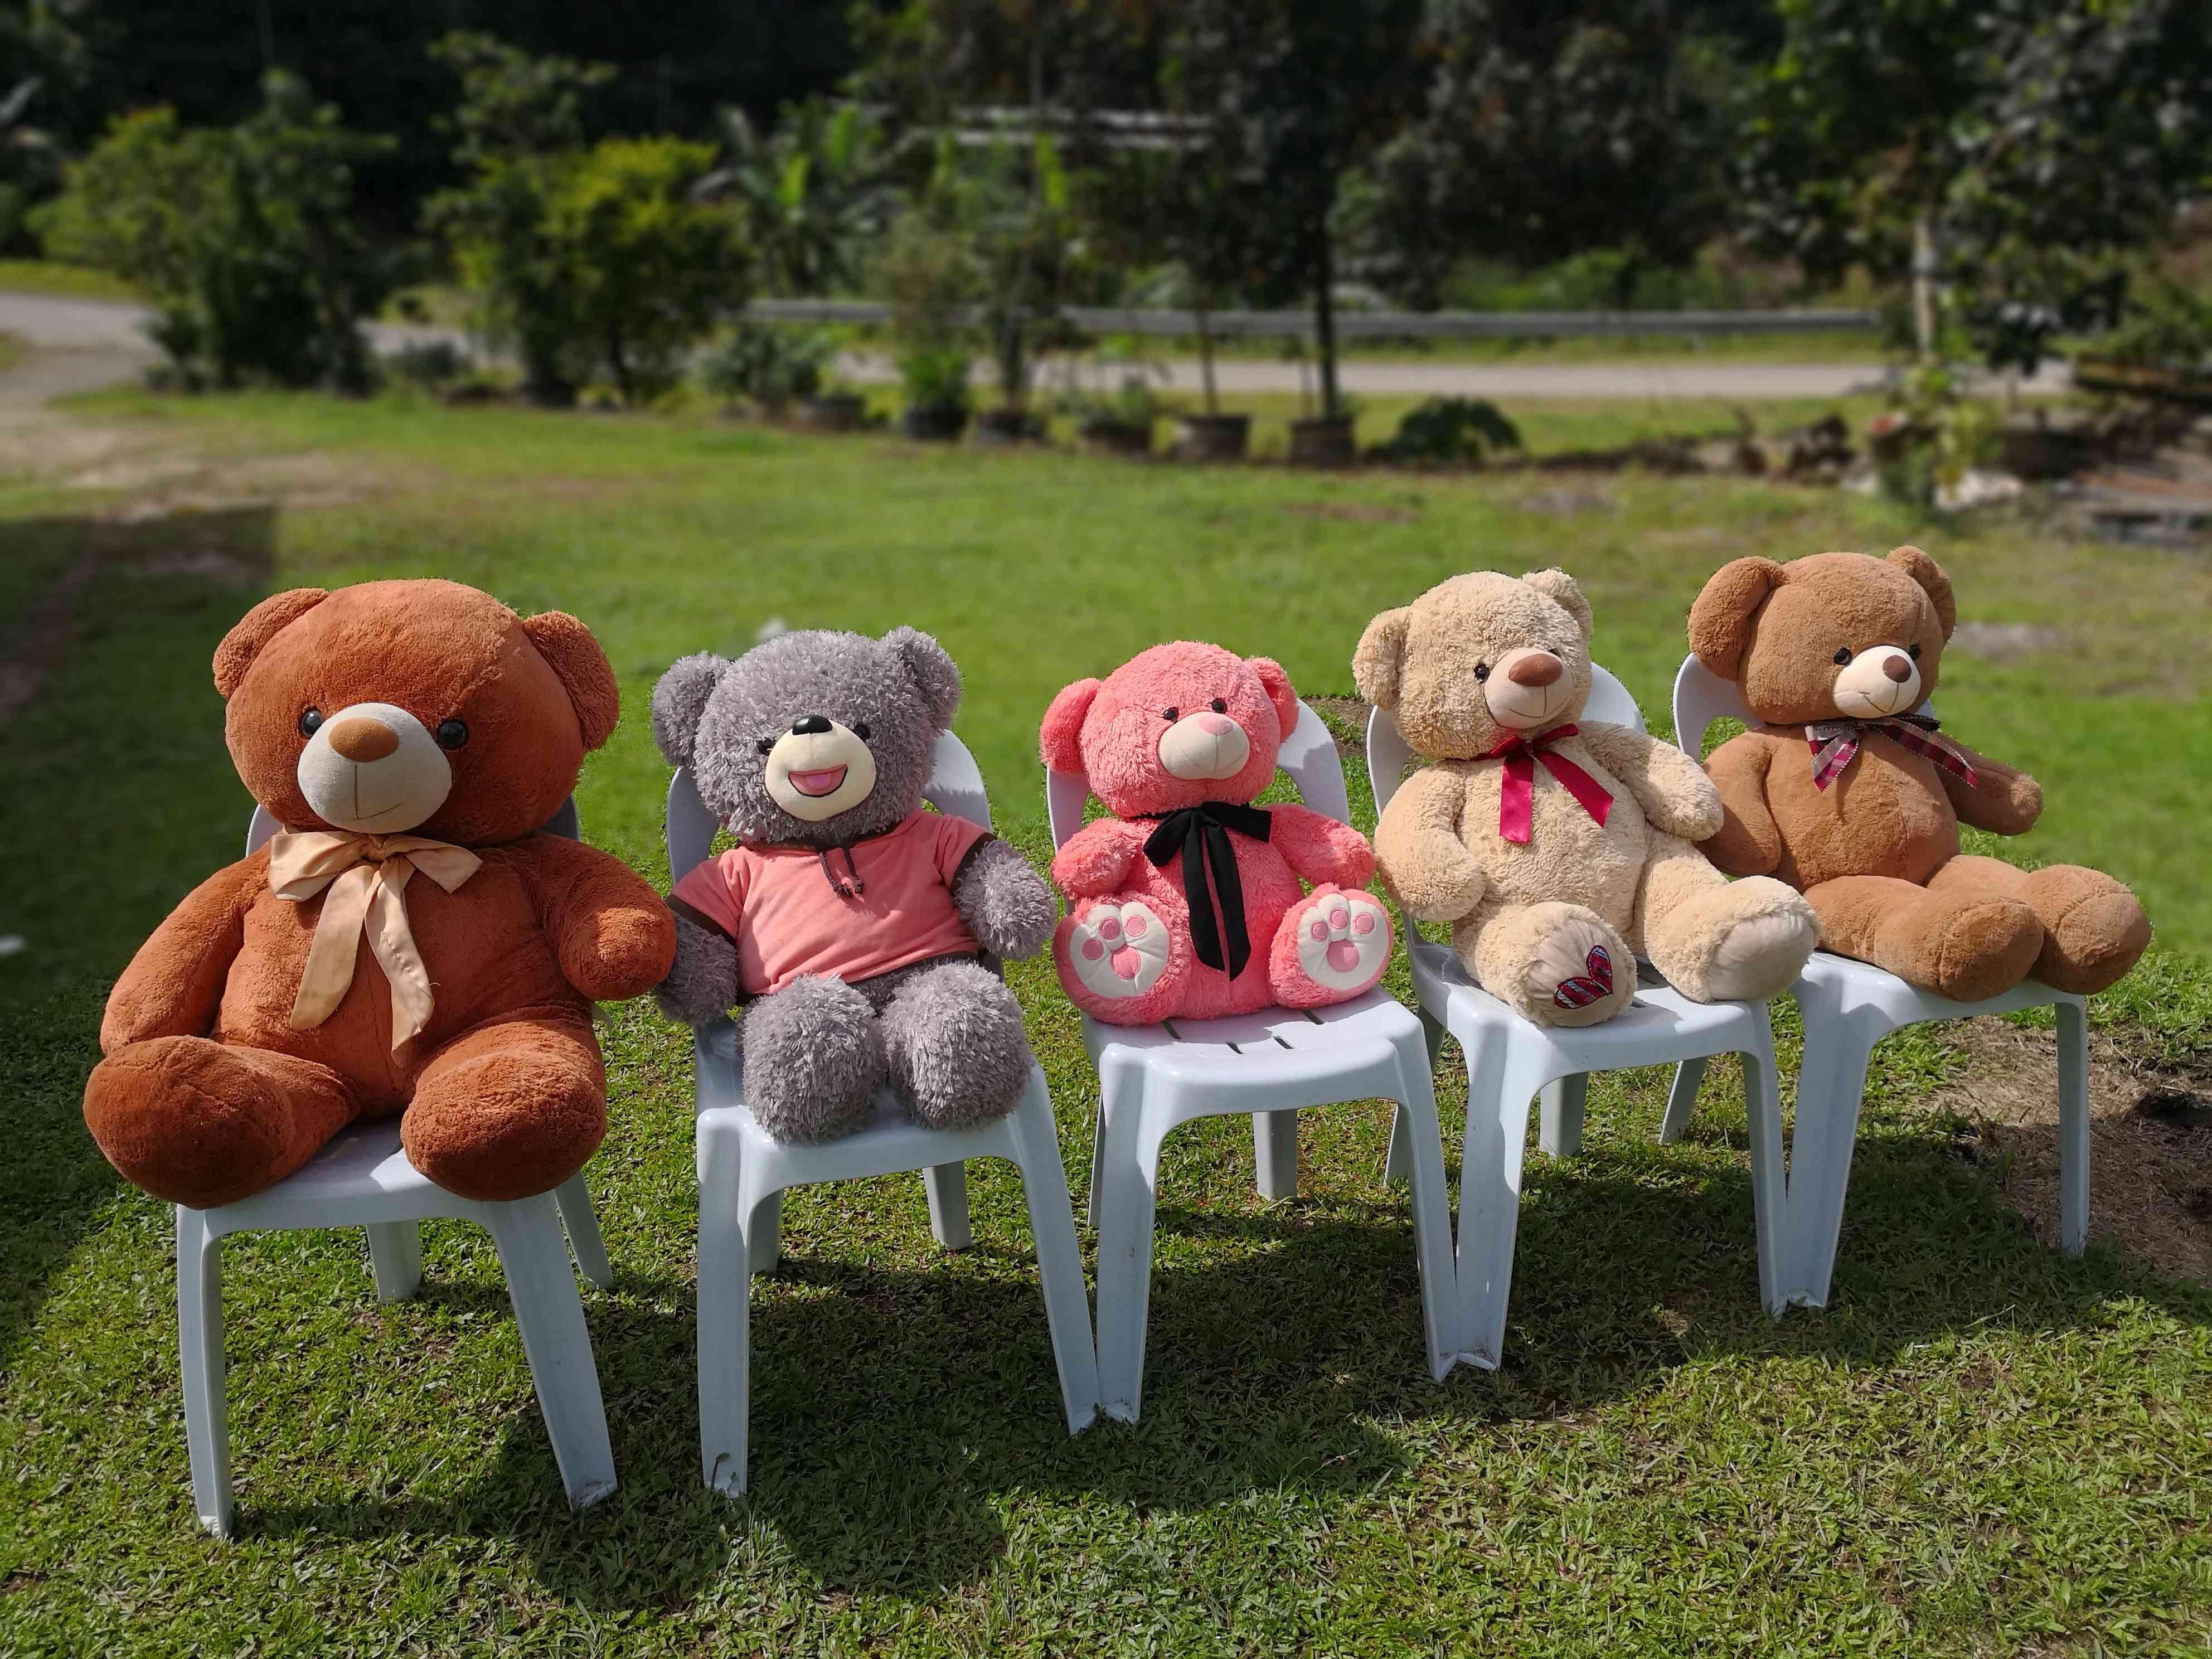 Stuffed Teddy Bears On Chairs In Lawn